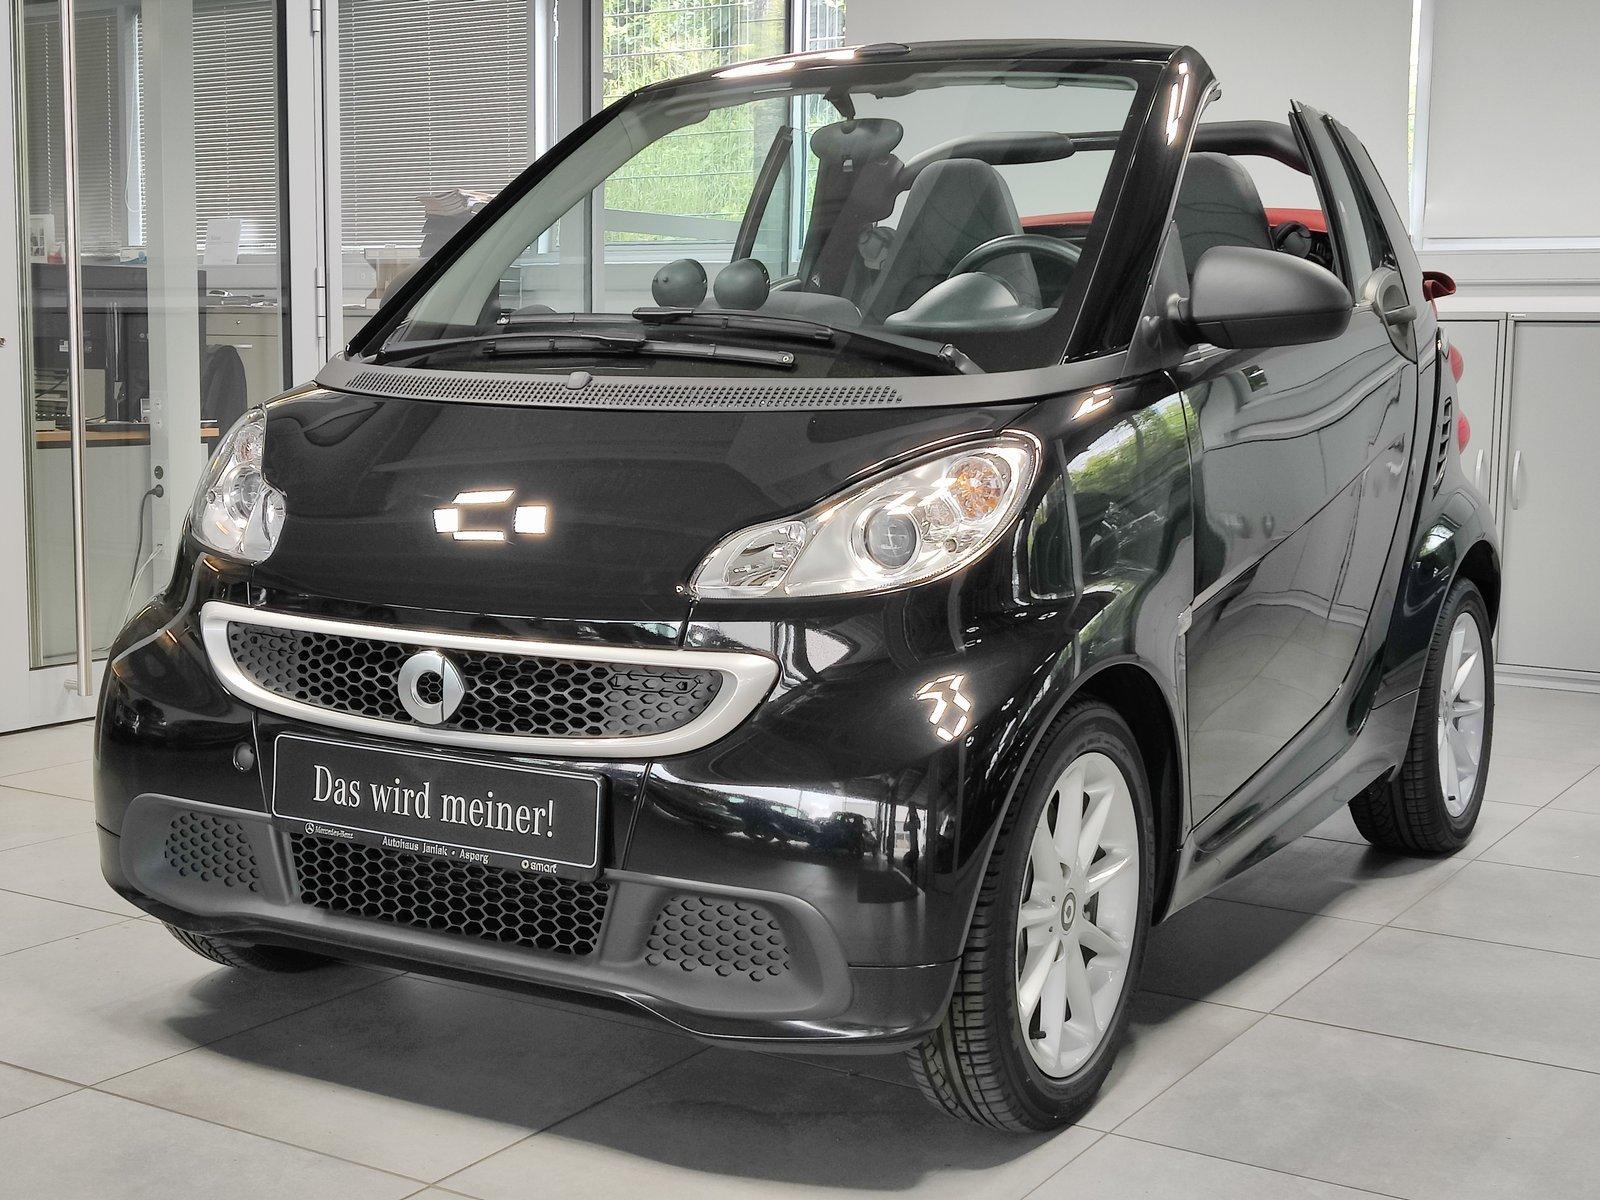 smart fortwo cabrio mhd Passion|Navi|Servo|Klima|SHZ, Jahr 2014, Benzin